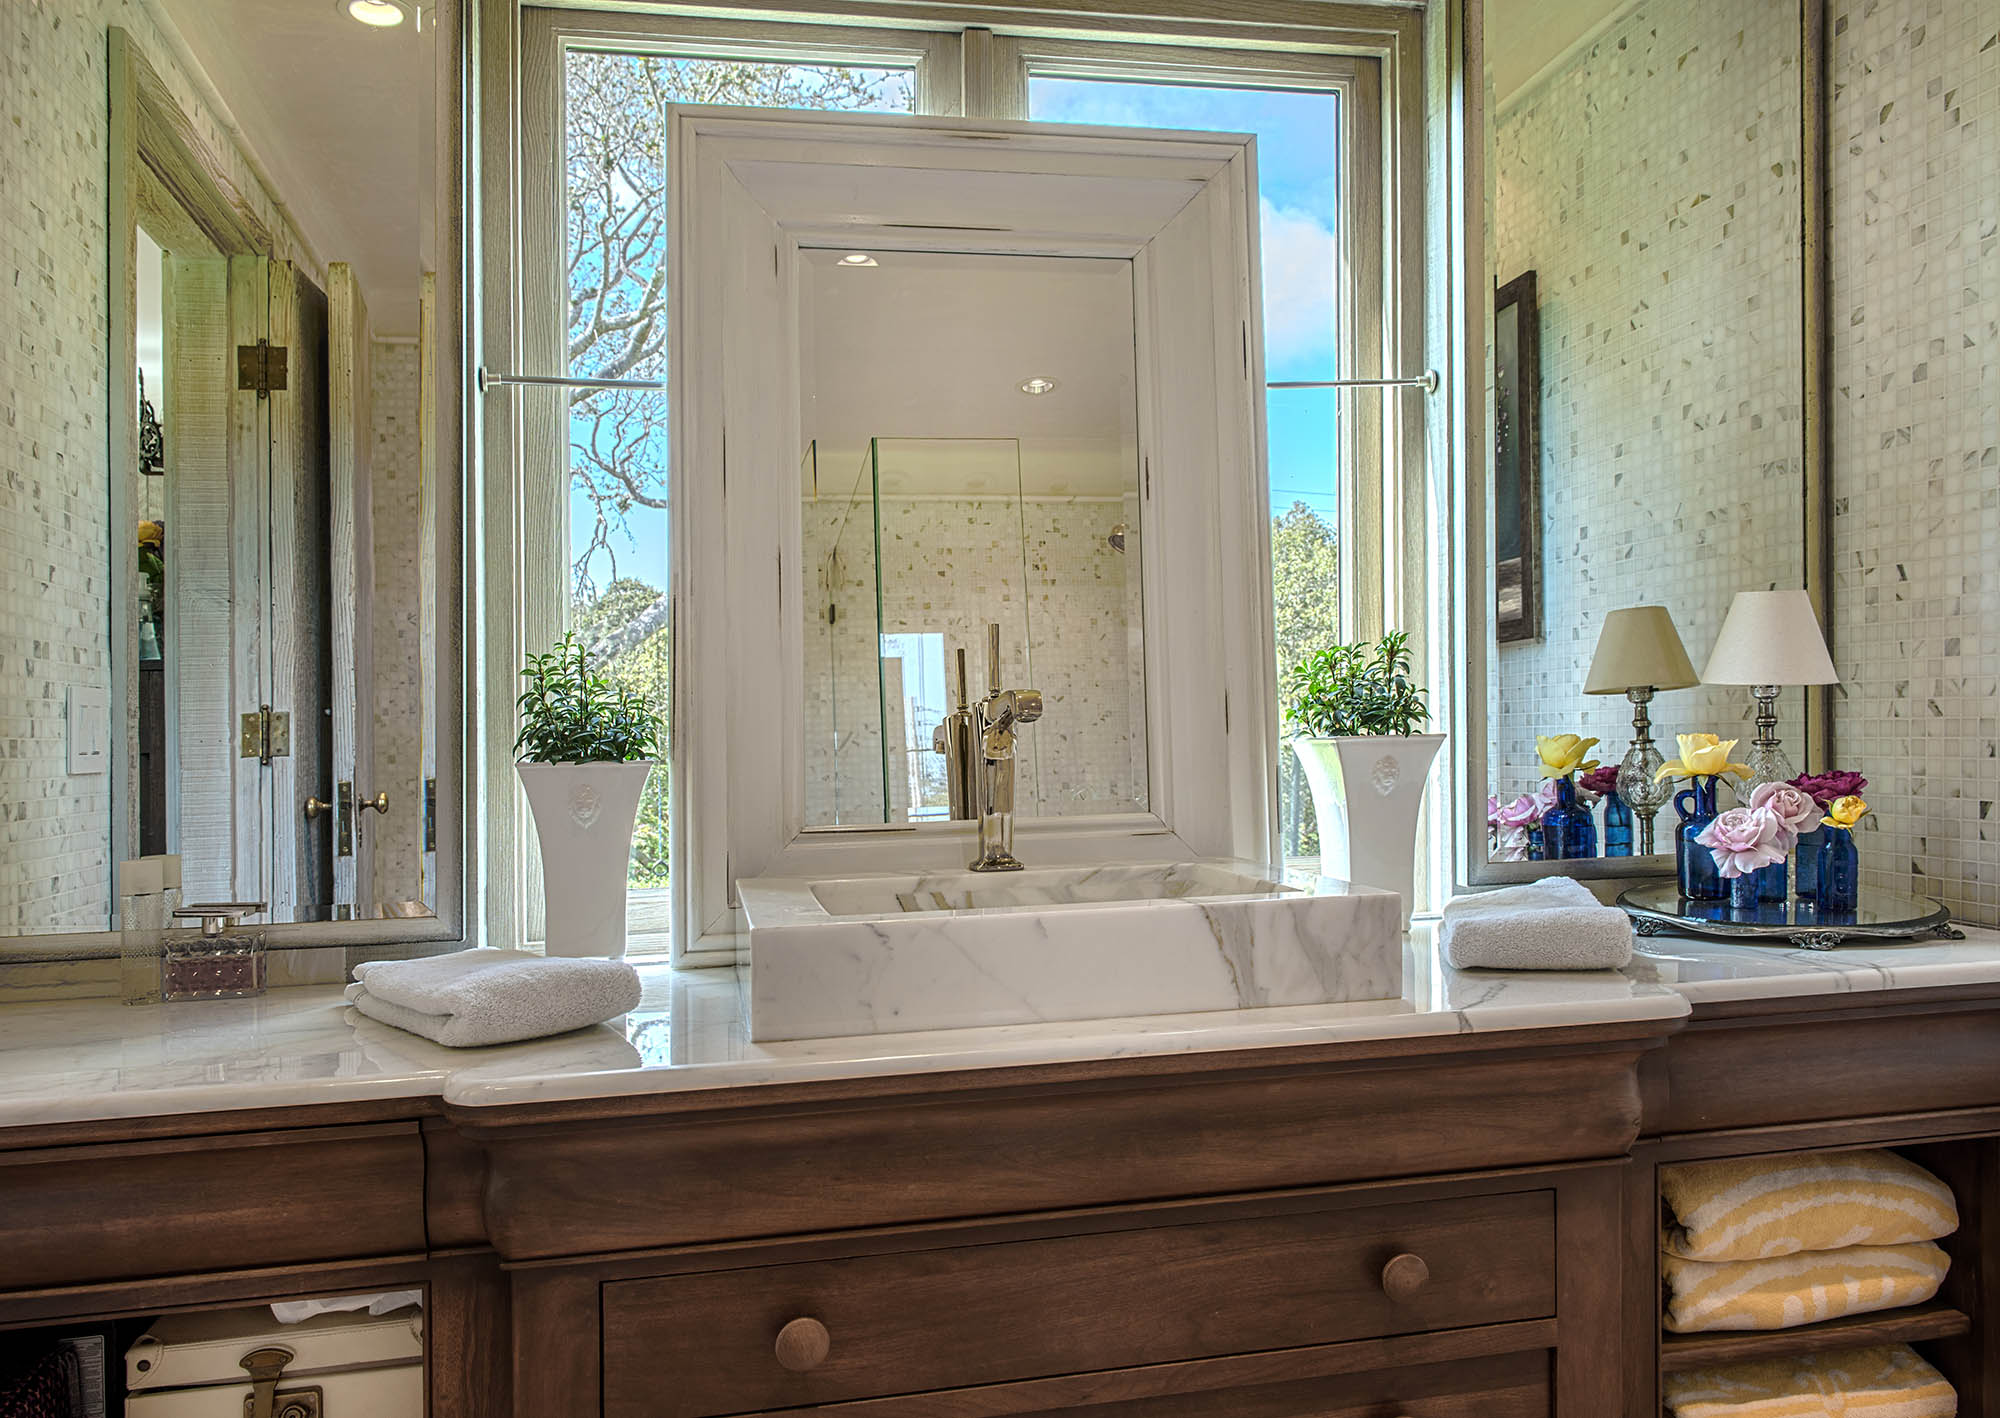 Calacatta Gold Marble Bathroom Carmel Stone Imports